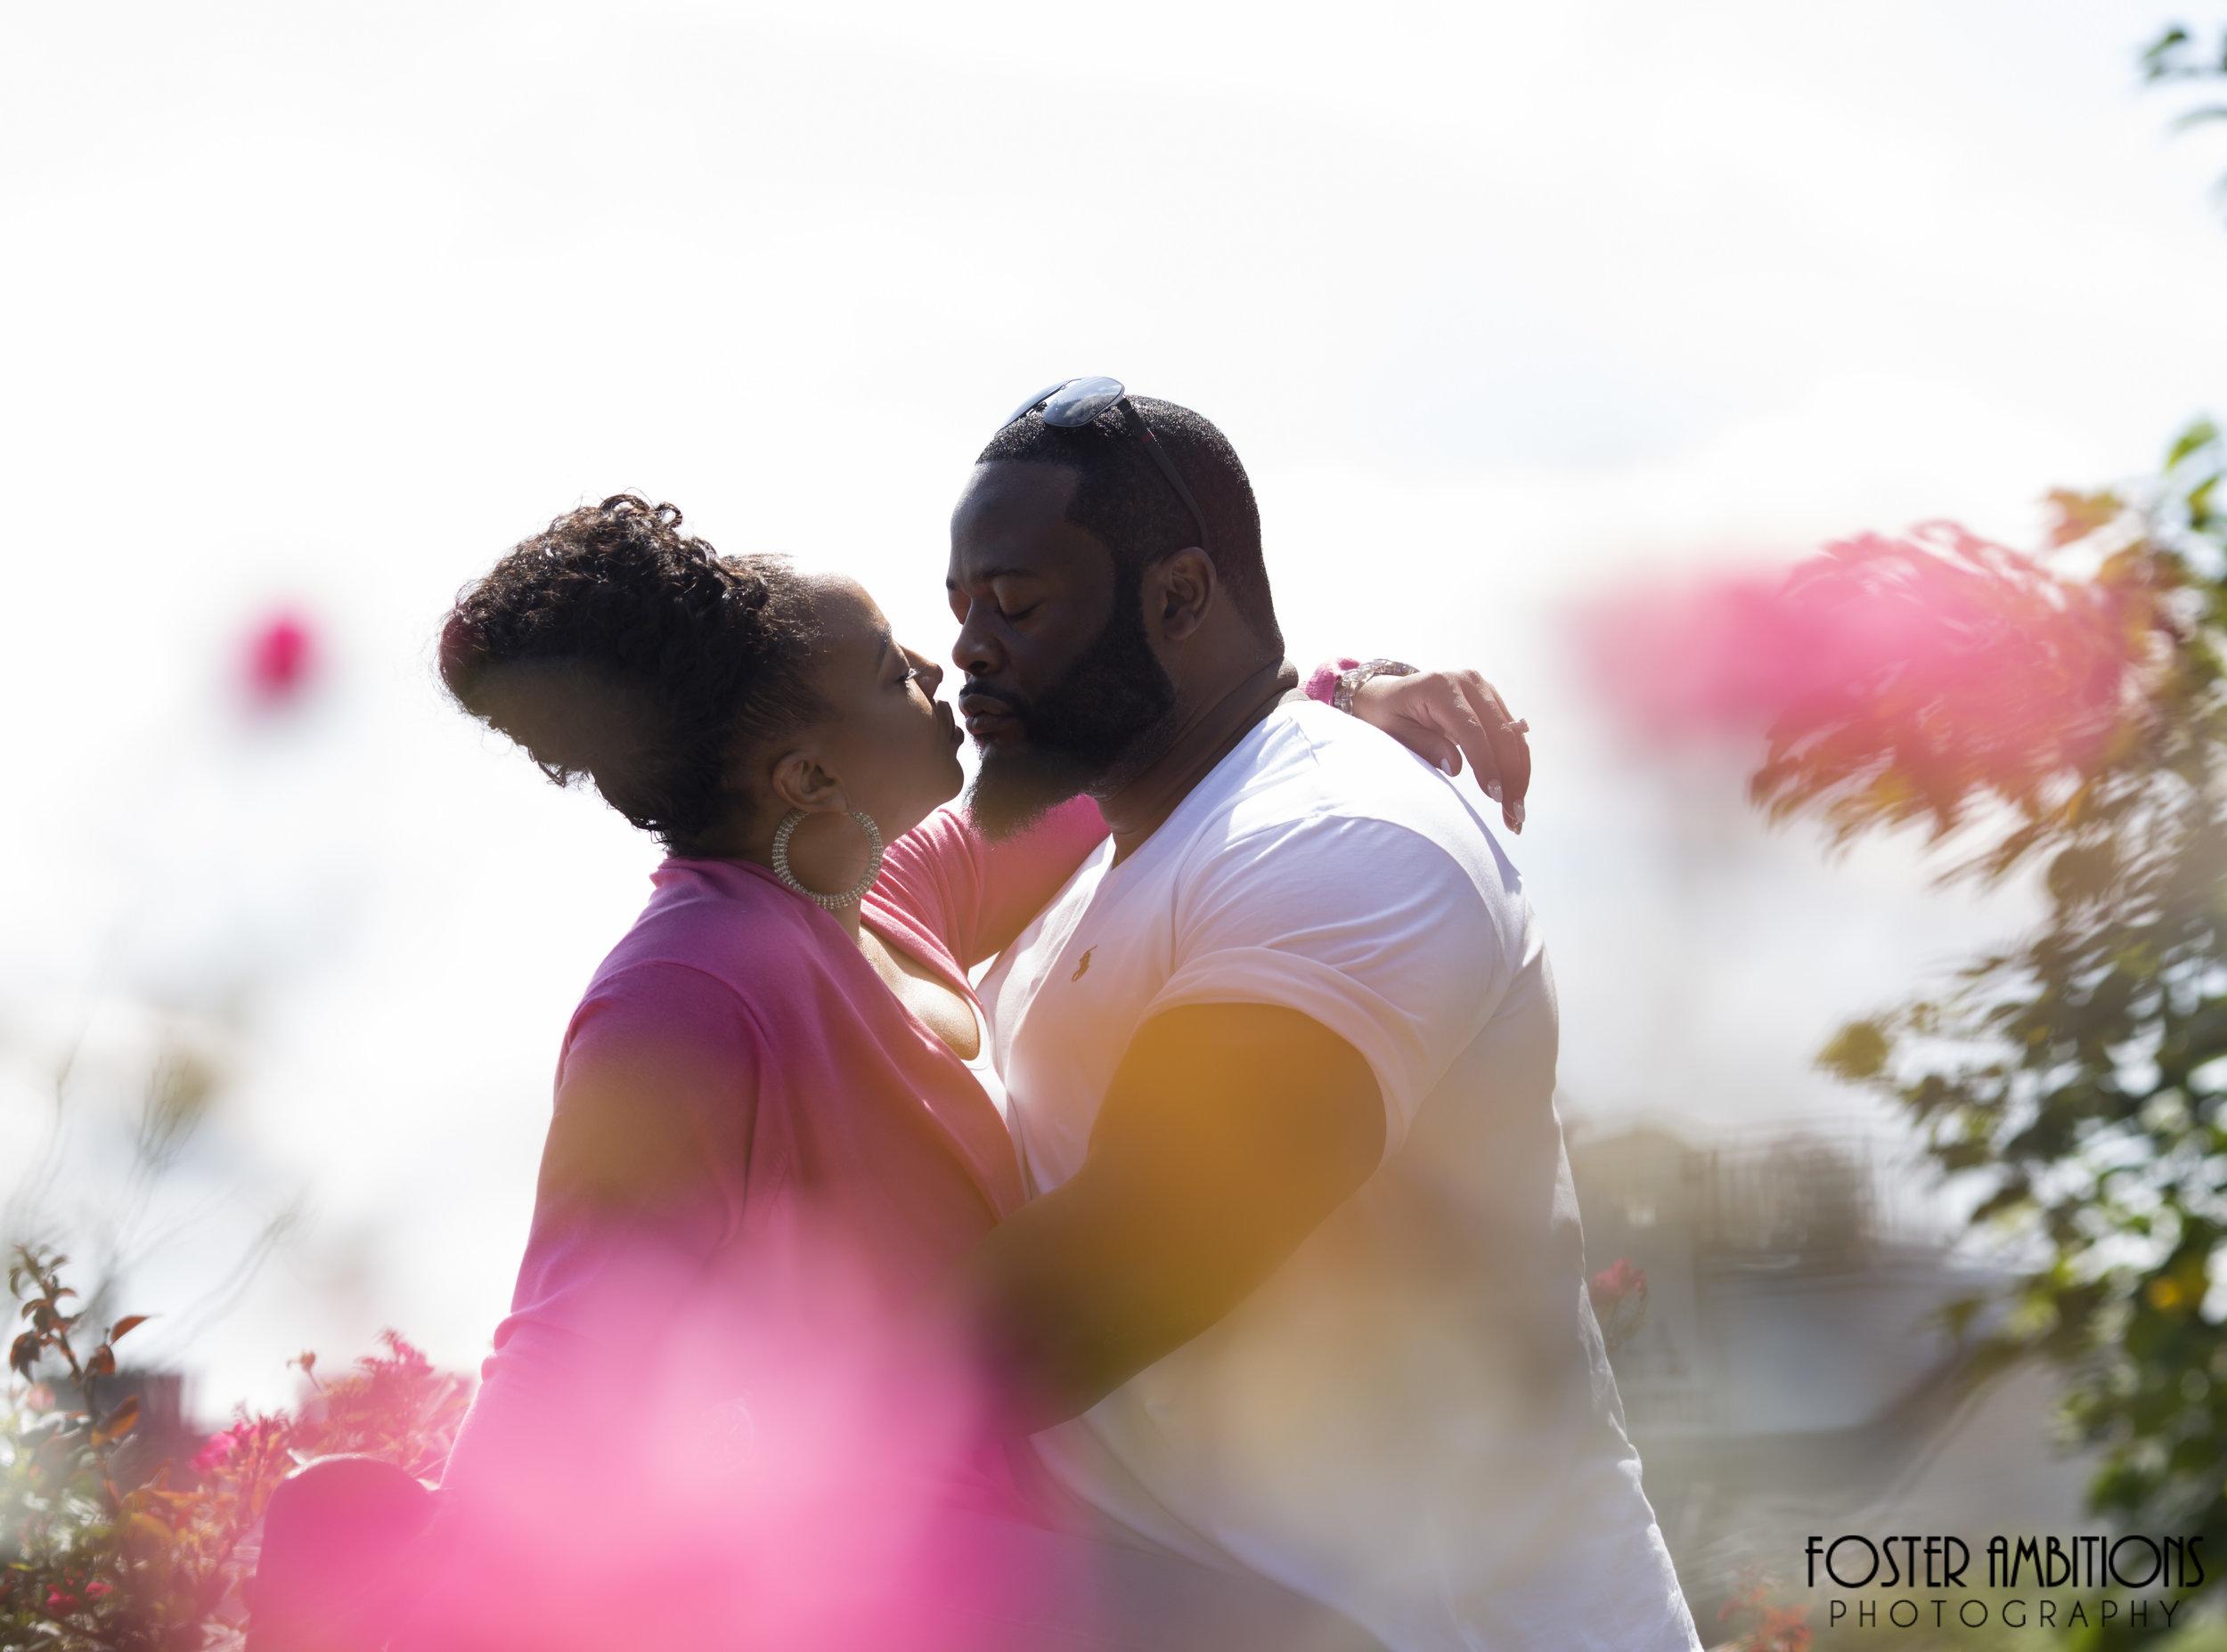 April & Ehren's Engagement Photoshoot-35.jpg